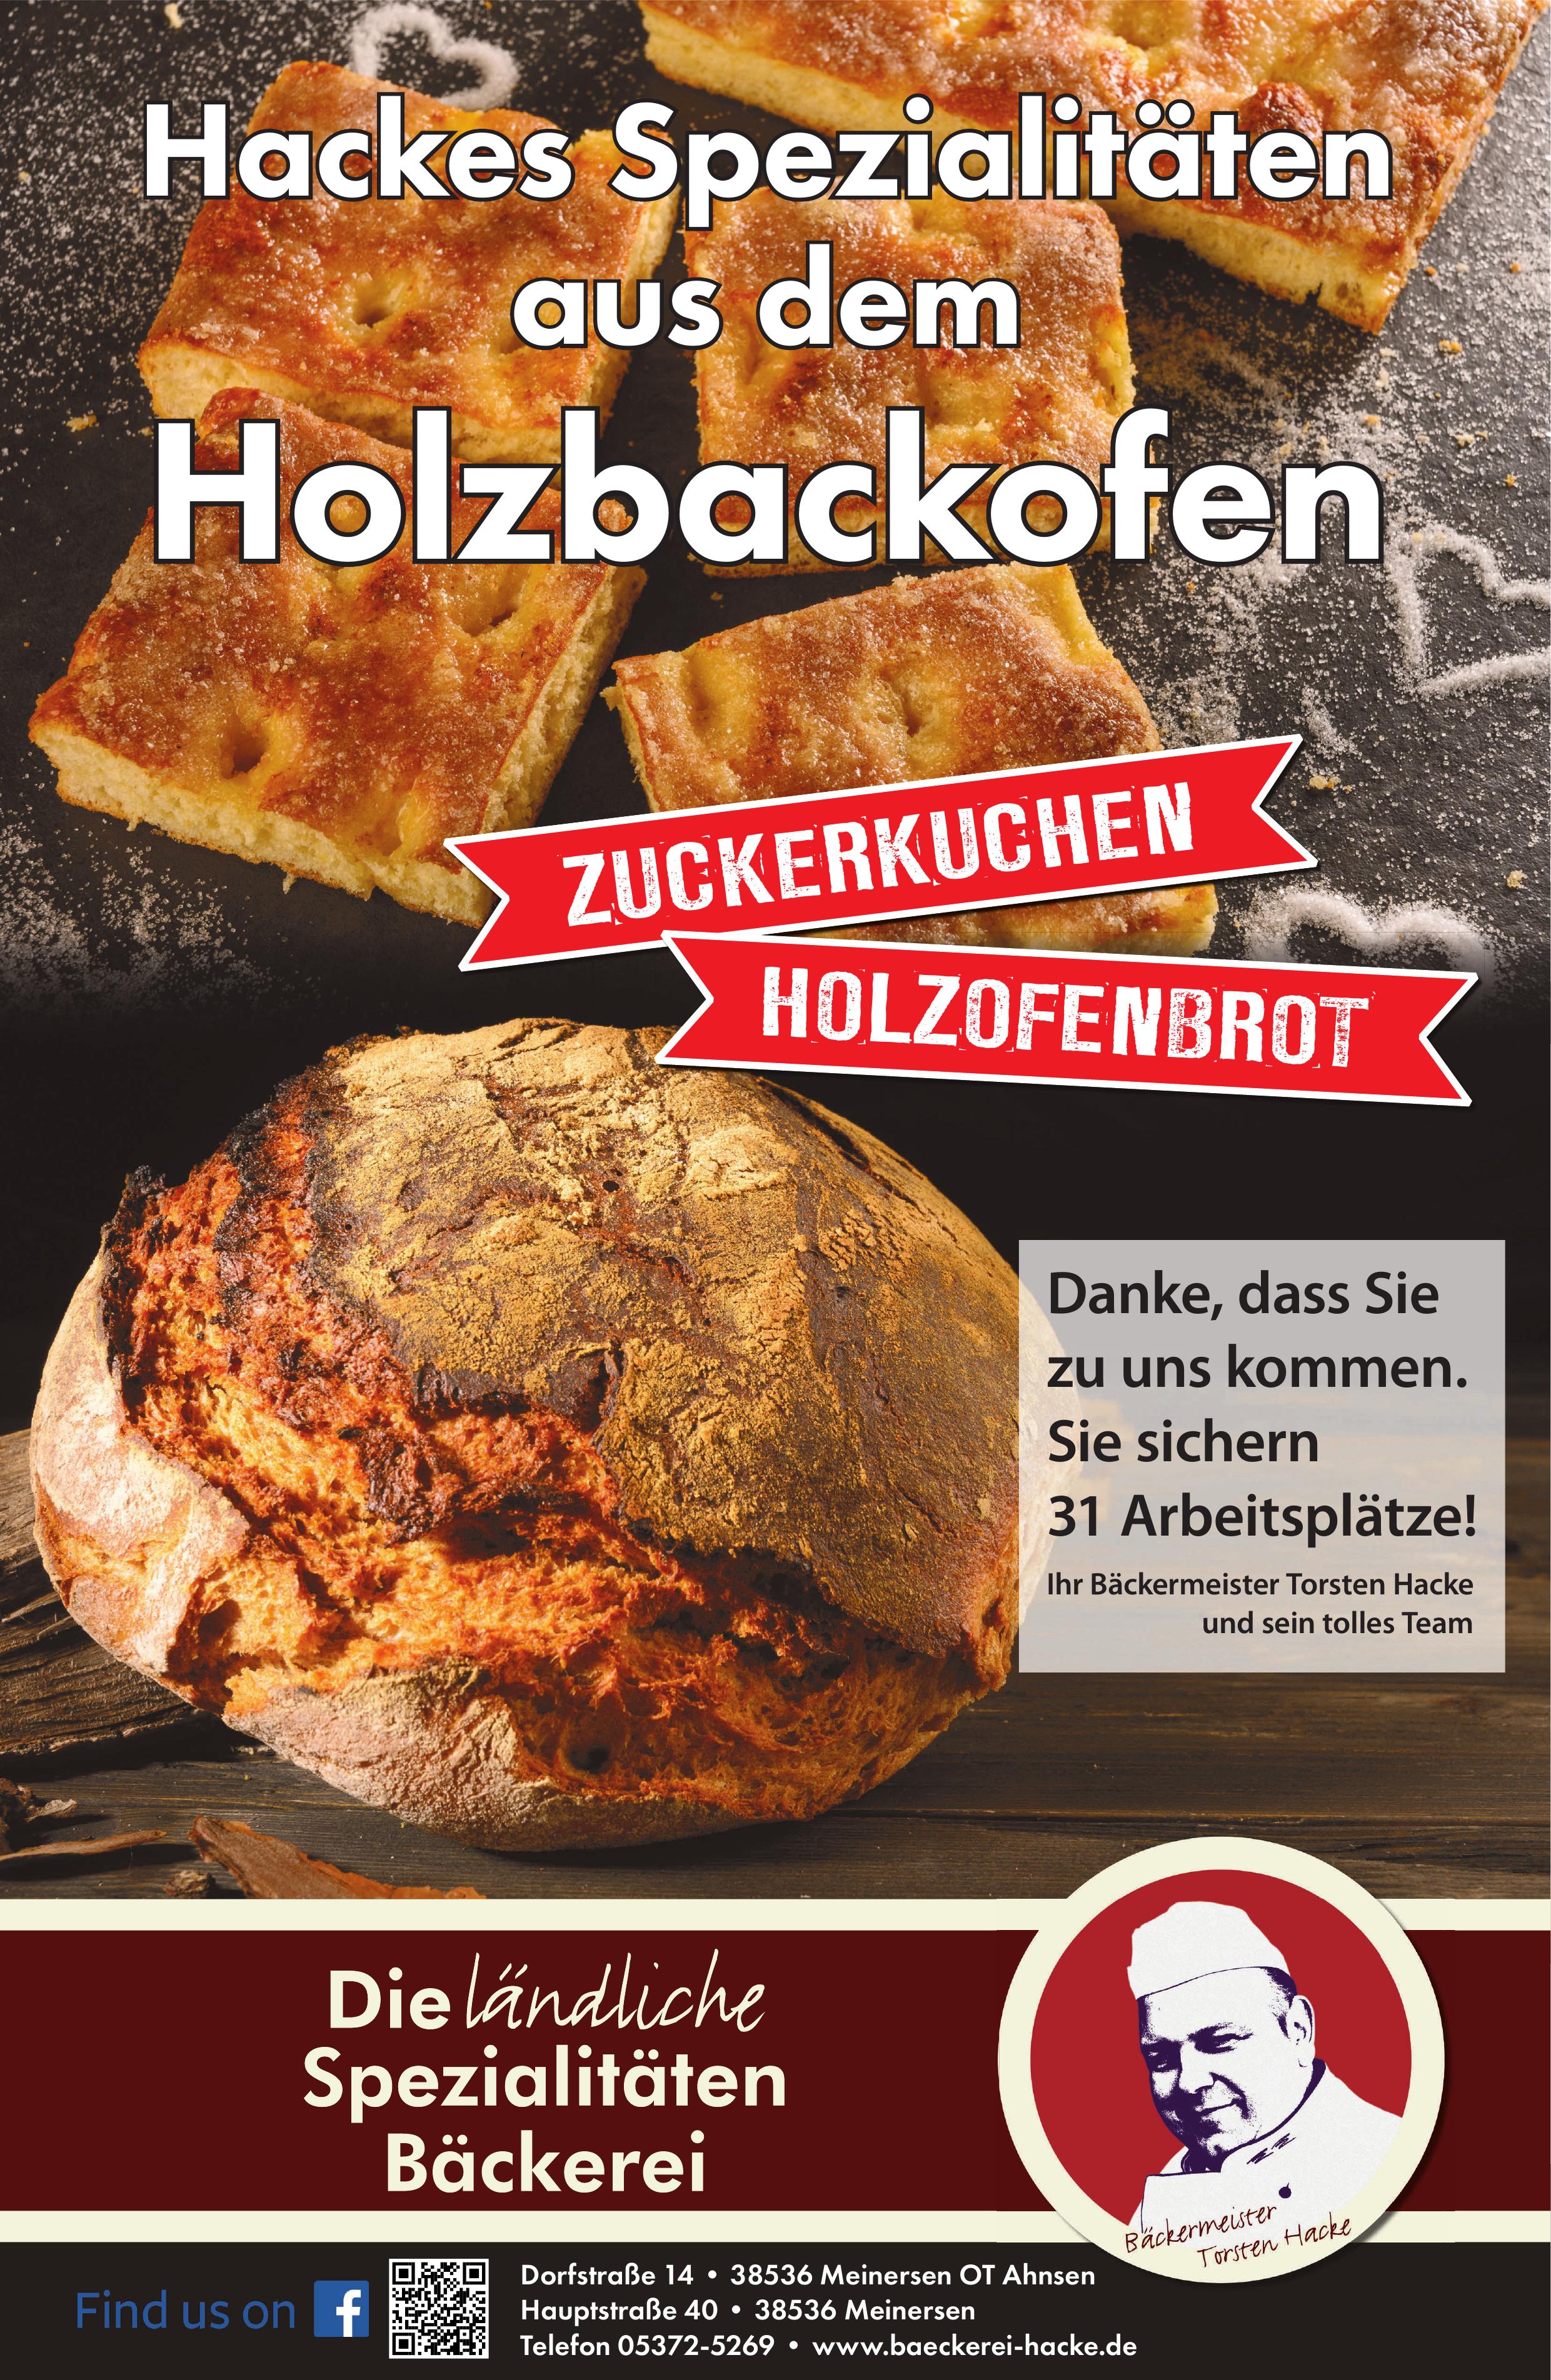 Bäckerei & Konditorei  Hacke GmbH